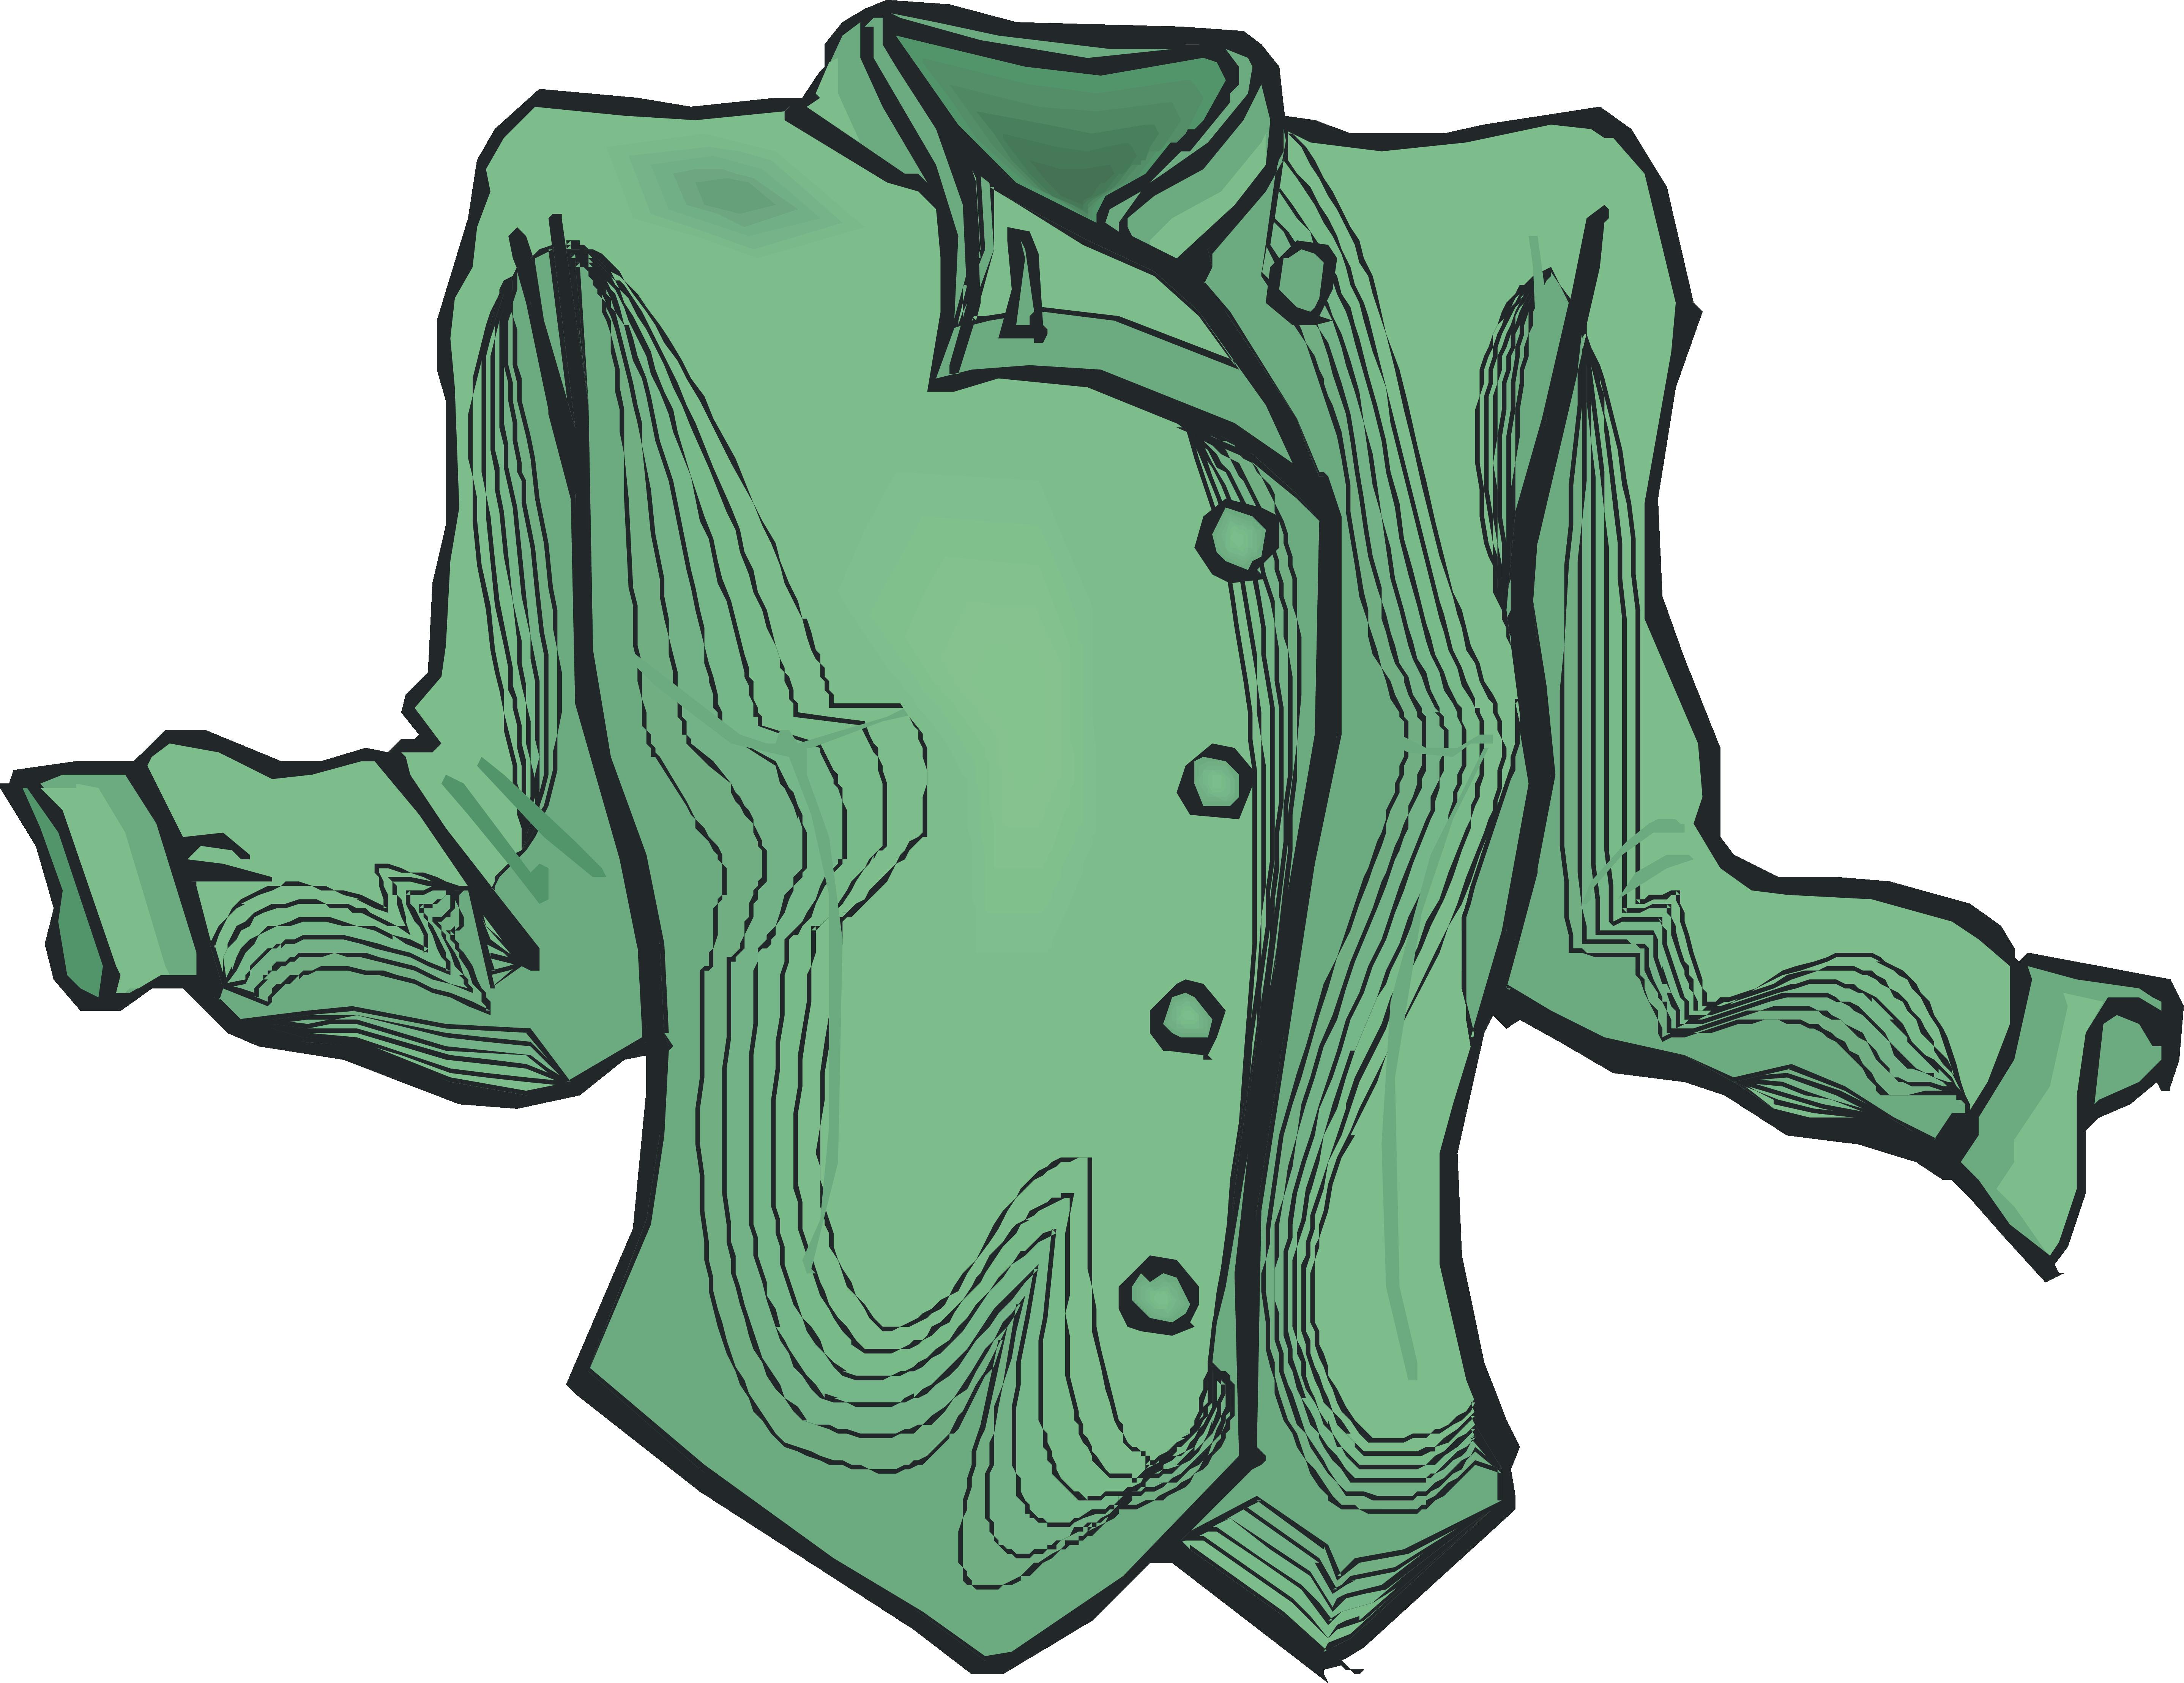 T blouse clothing clip. Clipart shirt green shirt